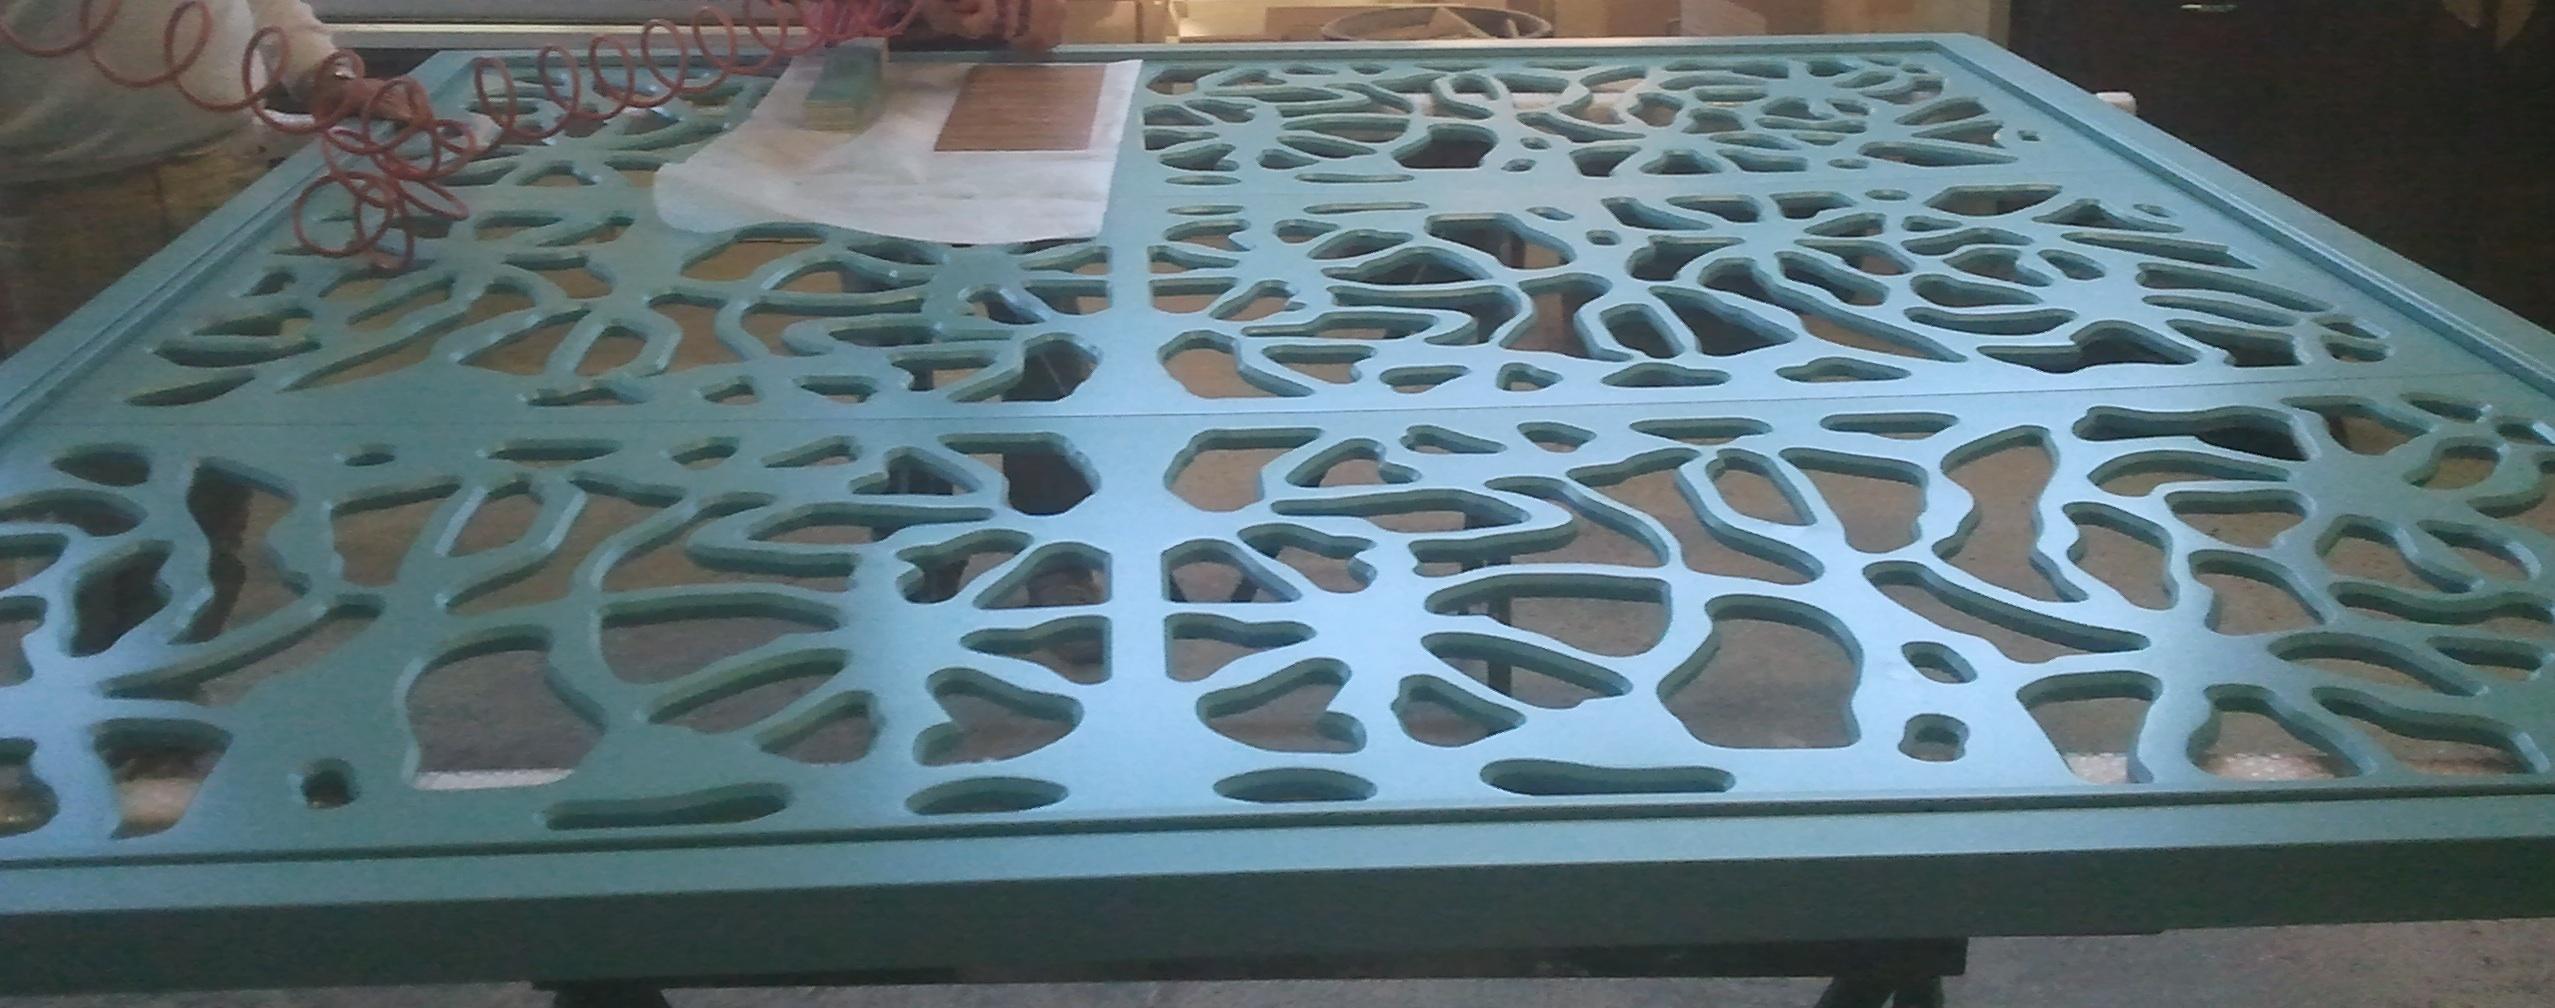 Arredi personalizzati falegnameria rd arredamenti s r l - Pannelli decorativi fai da te ...